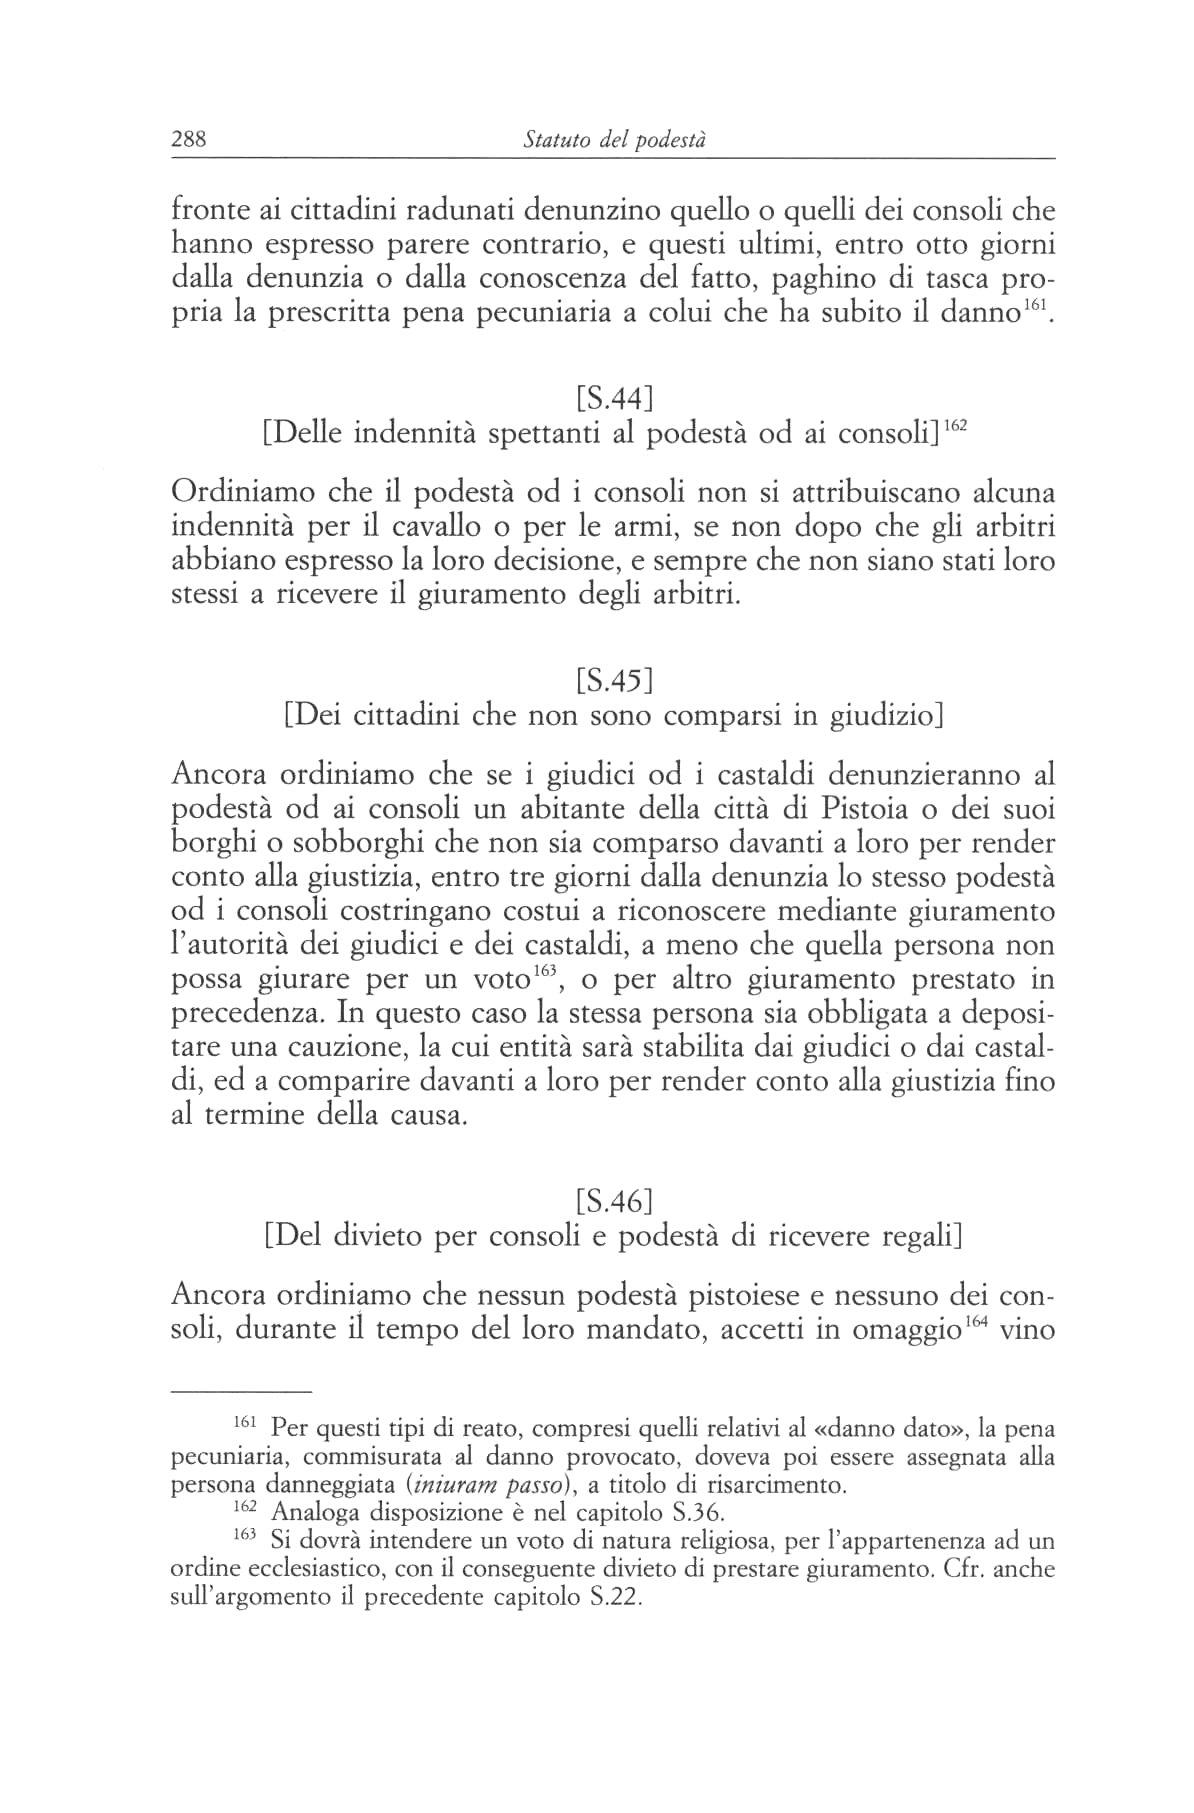 statuti pistoiesi del sec.XII 0288.jpg